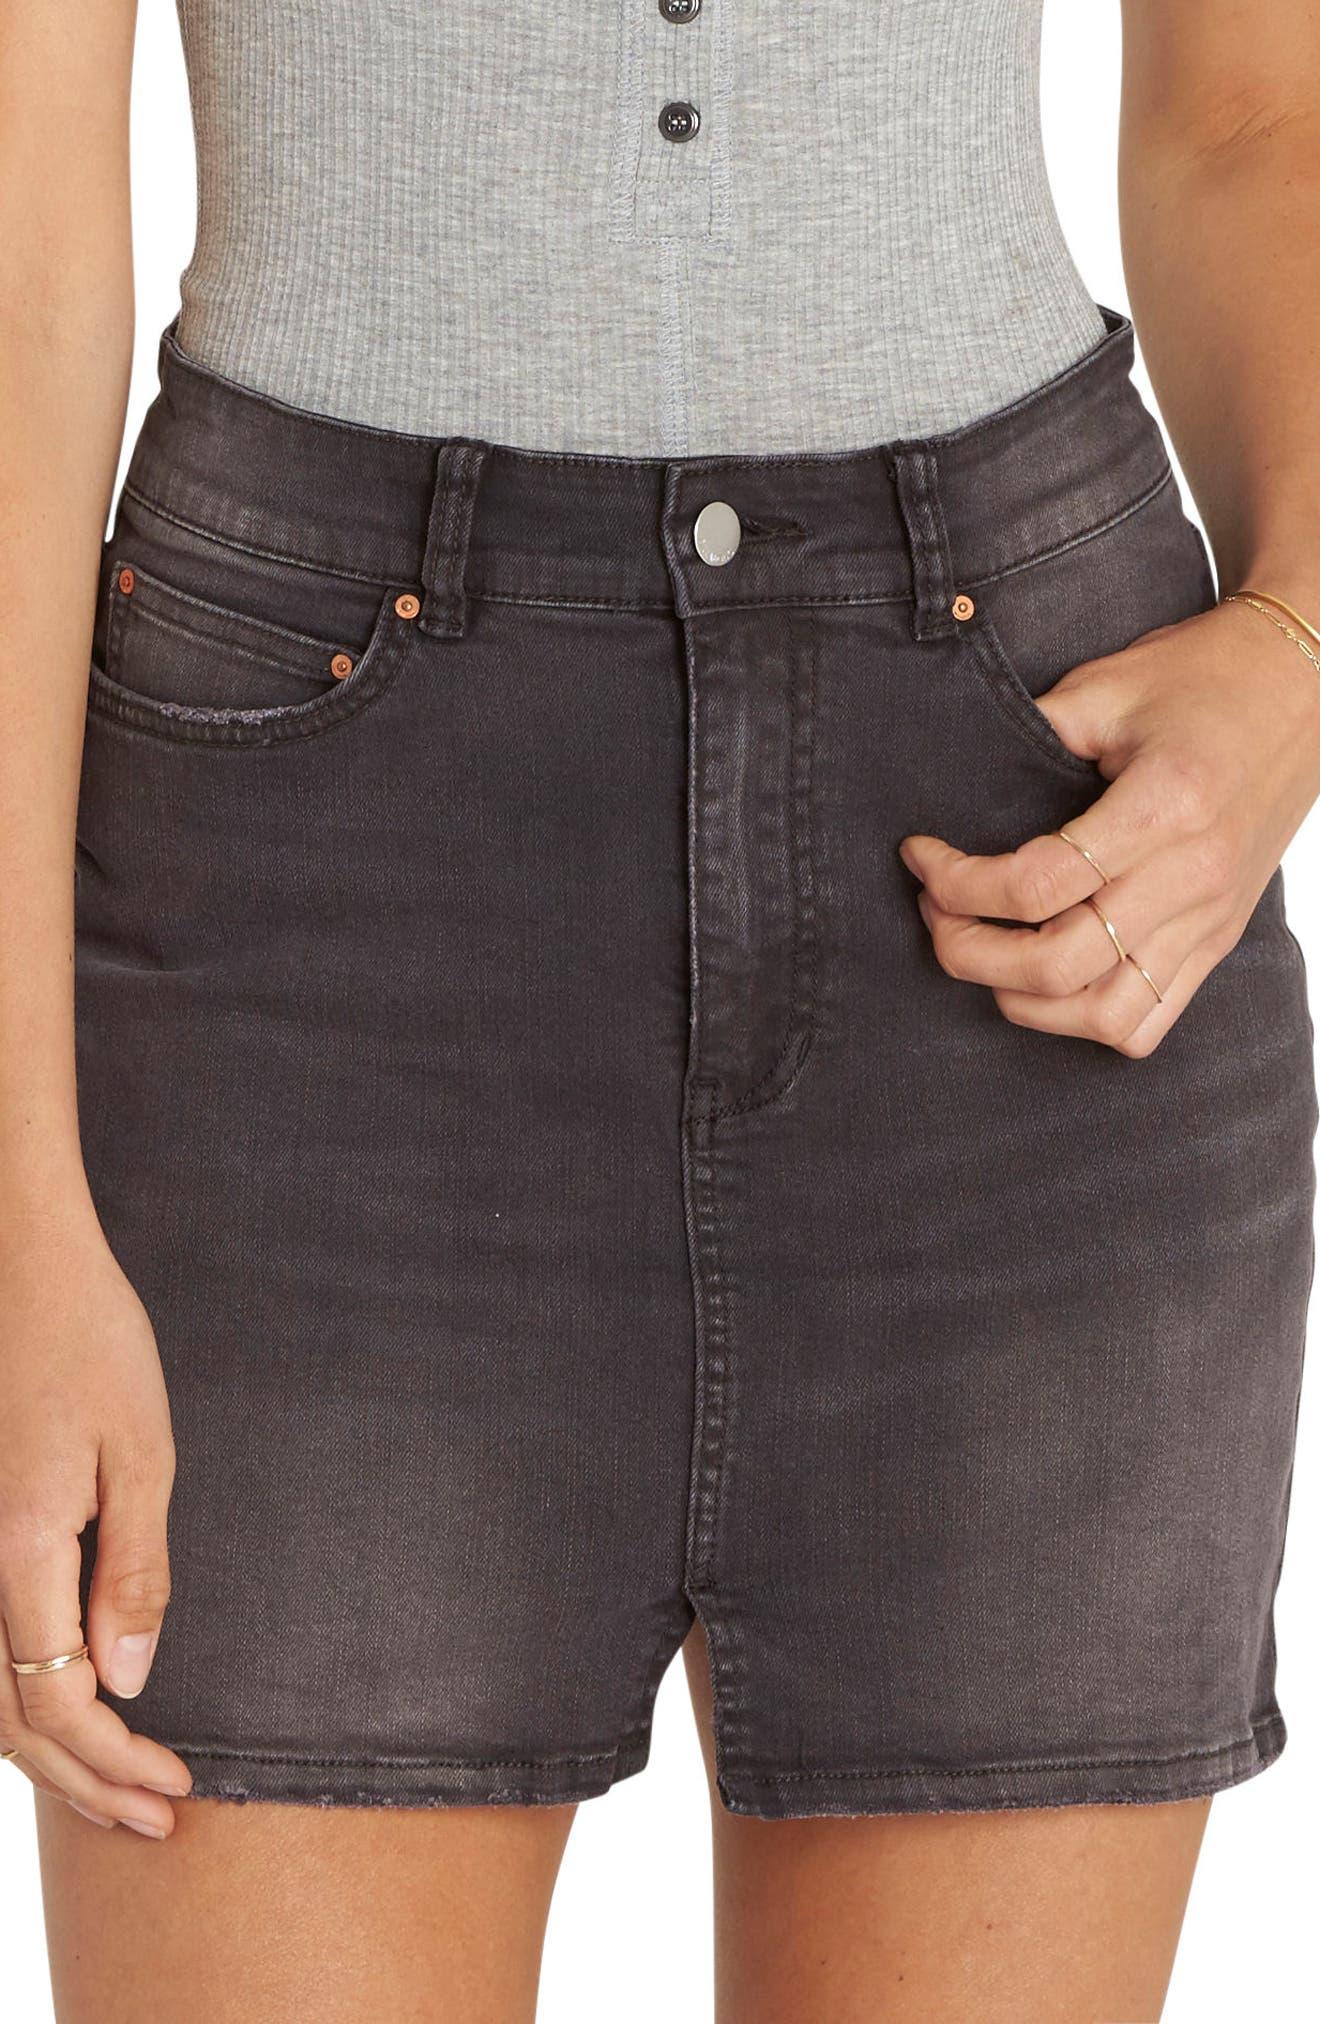 Black Magic Denim Skirt,                         Main,                         color, Black Pebble